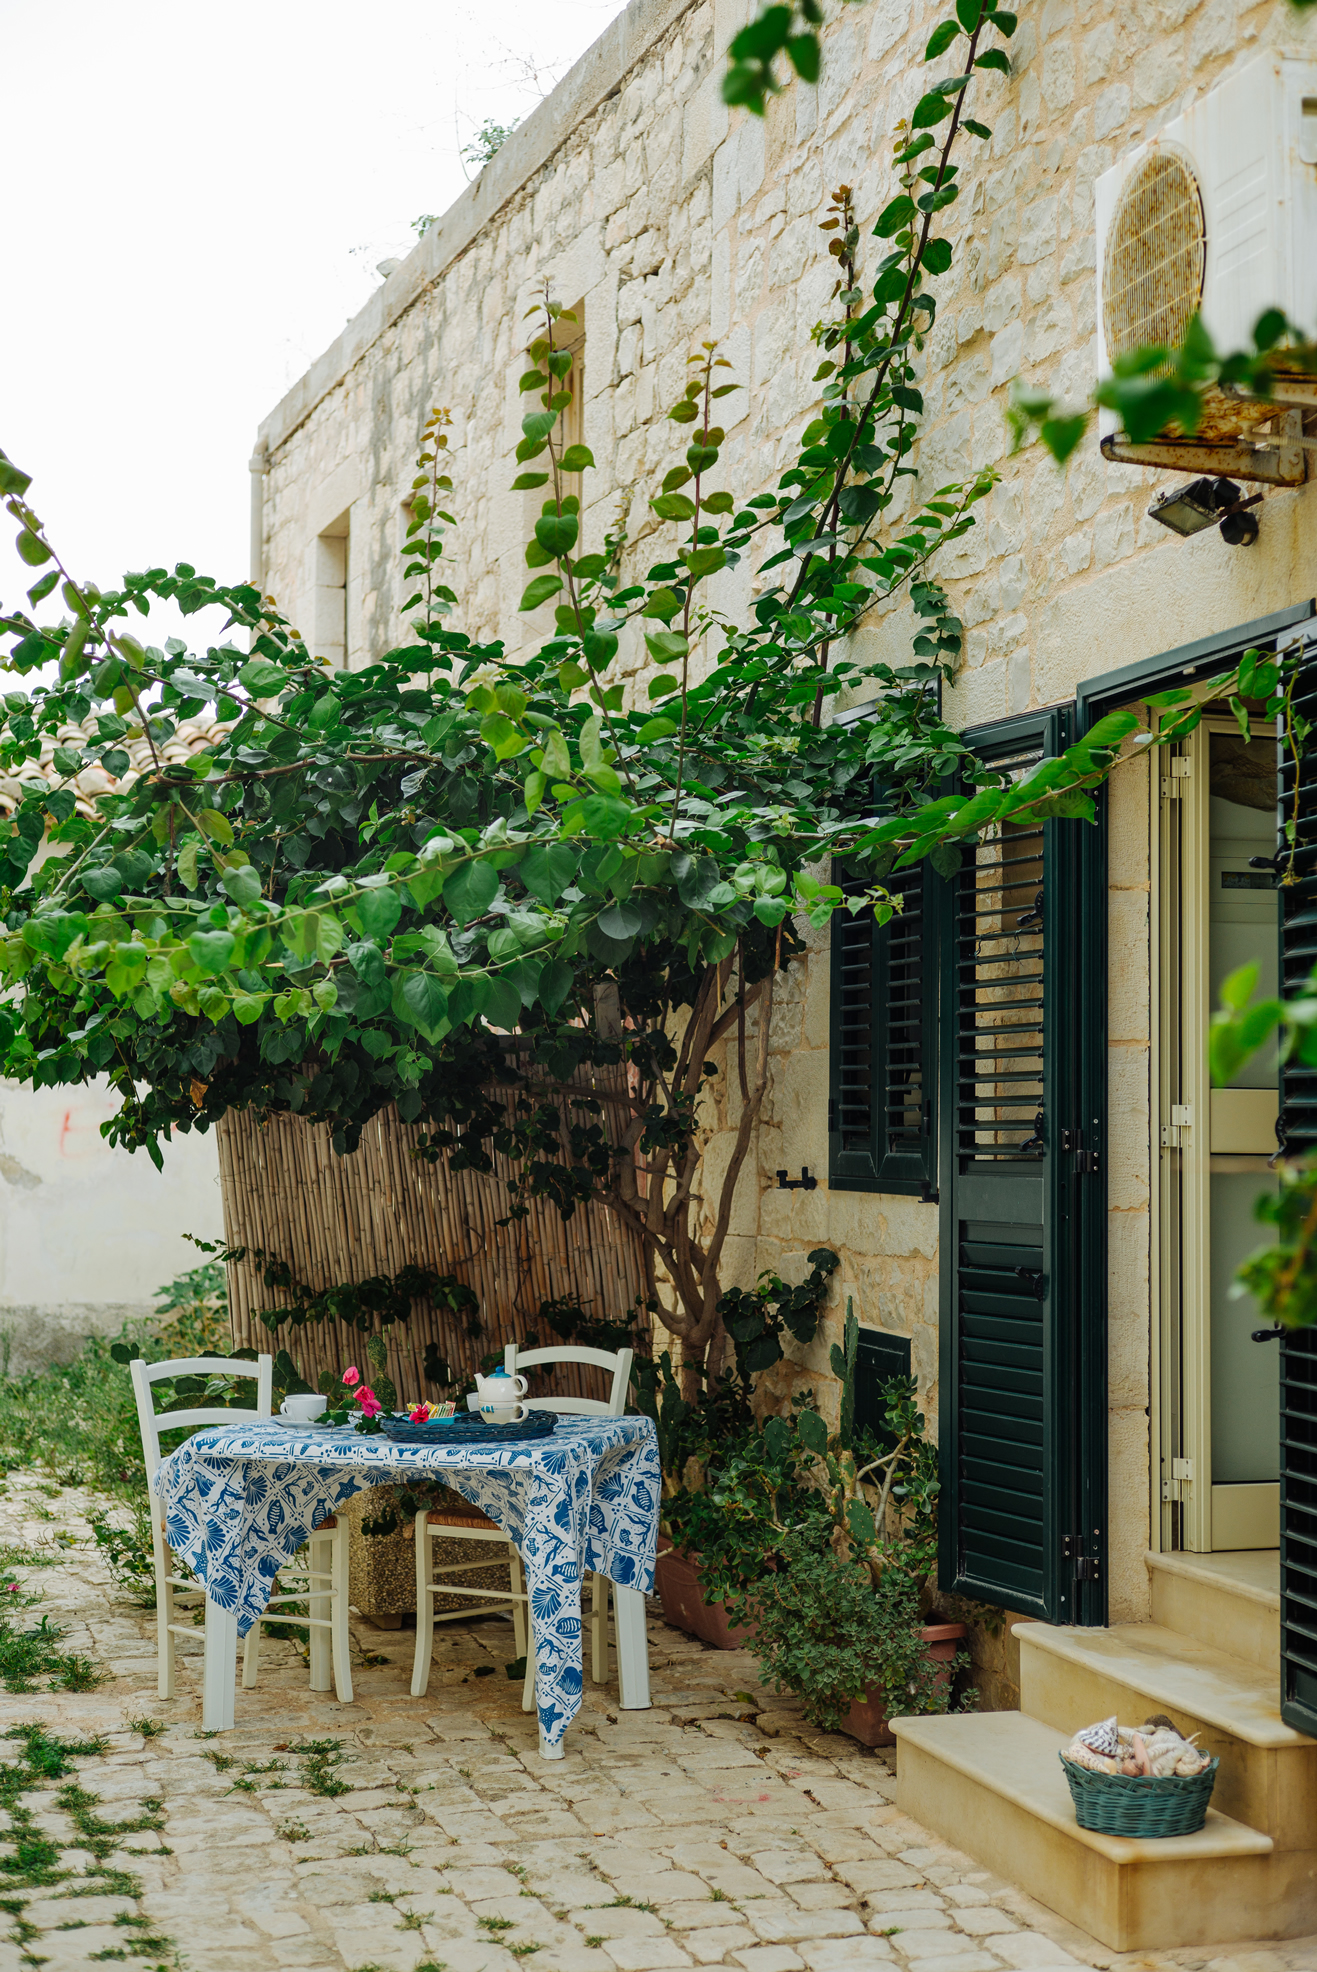 1sampieri-casa-vacanze-sicilia-appartamento-sicily-holiday-apartment-casa-del-pescatore-italia-italy.jpg